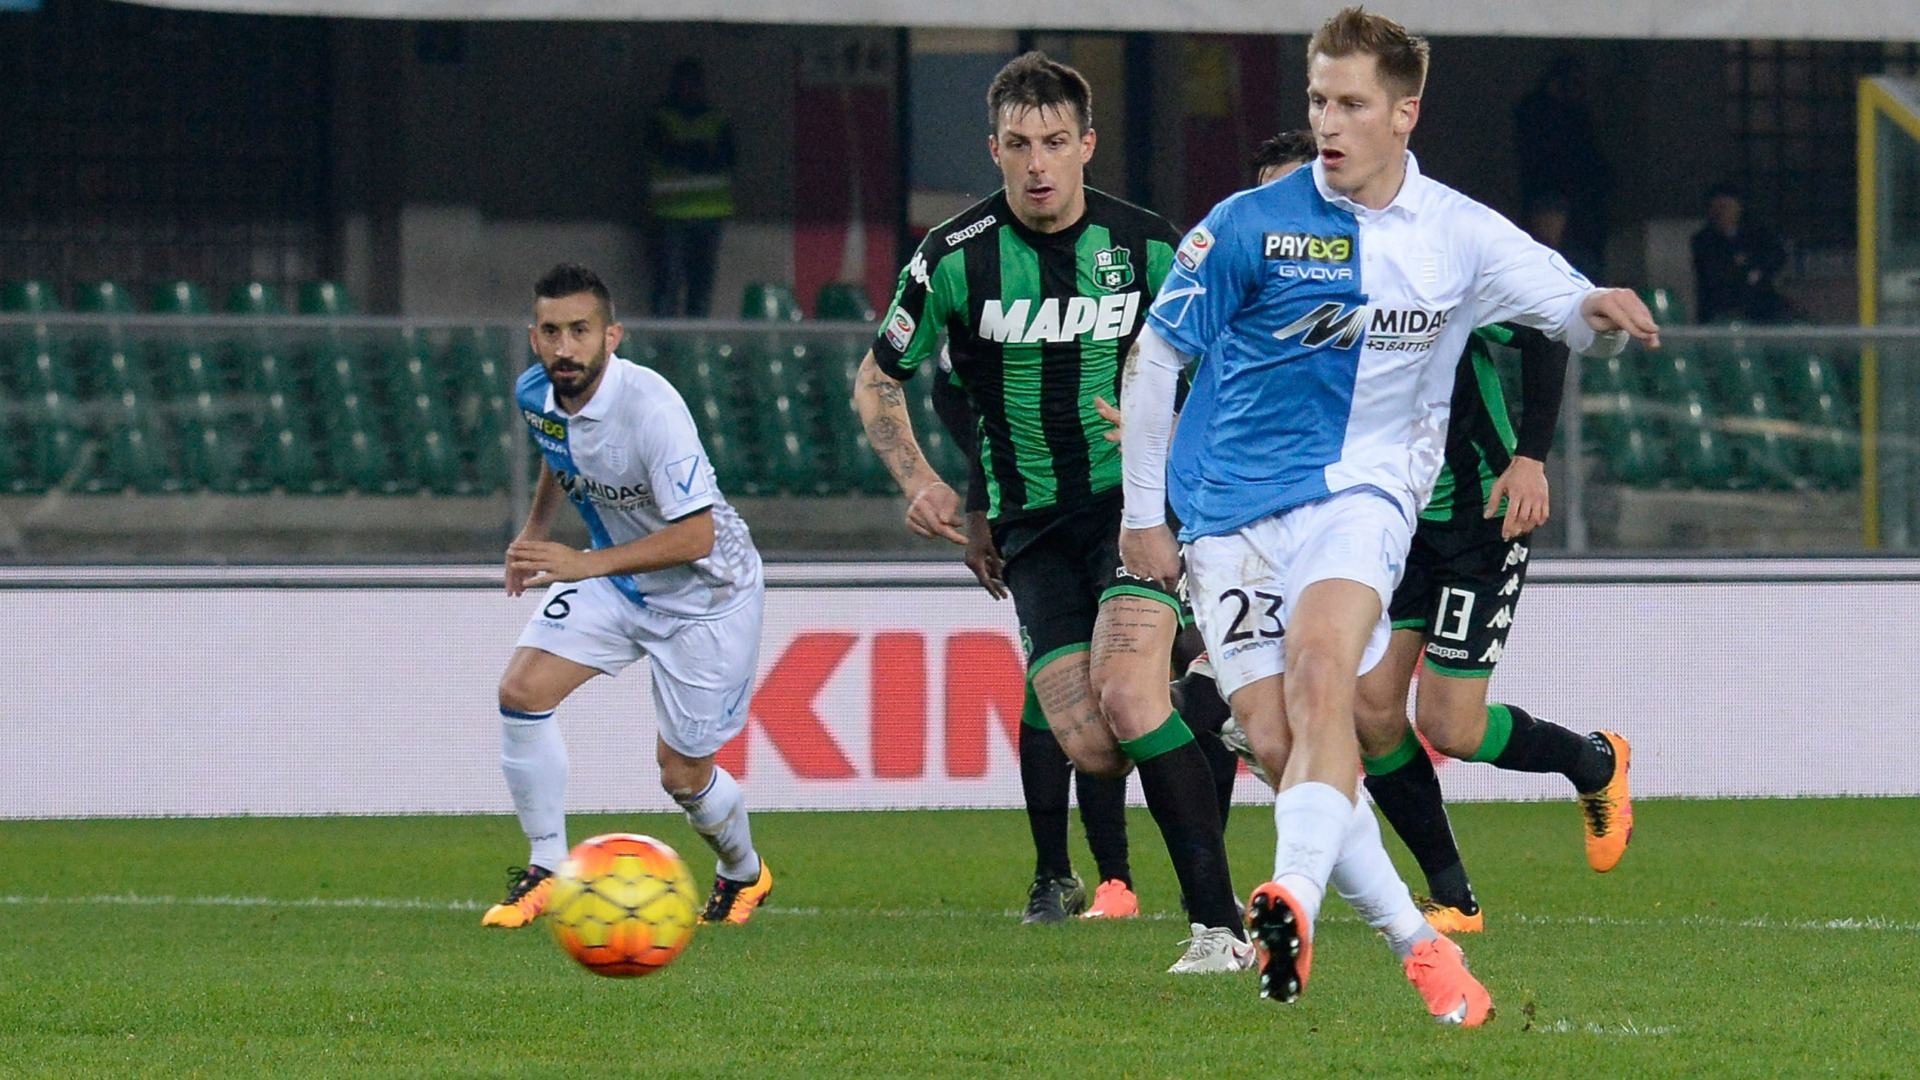 Video: Chievo vs Sassuolo